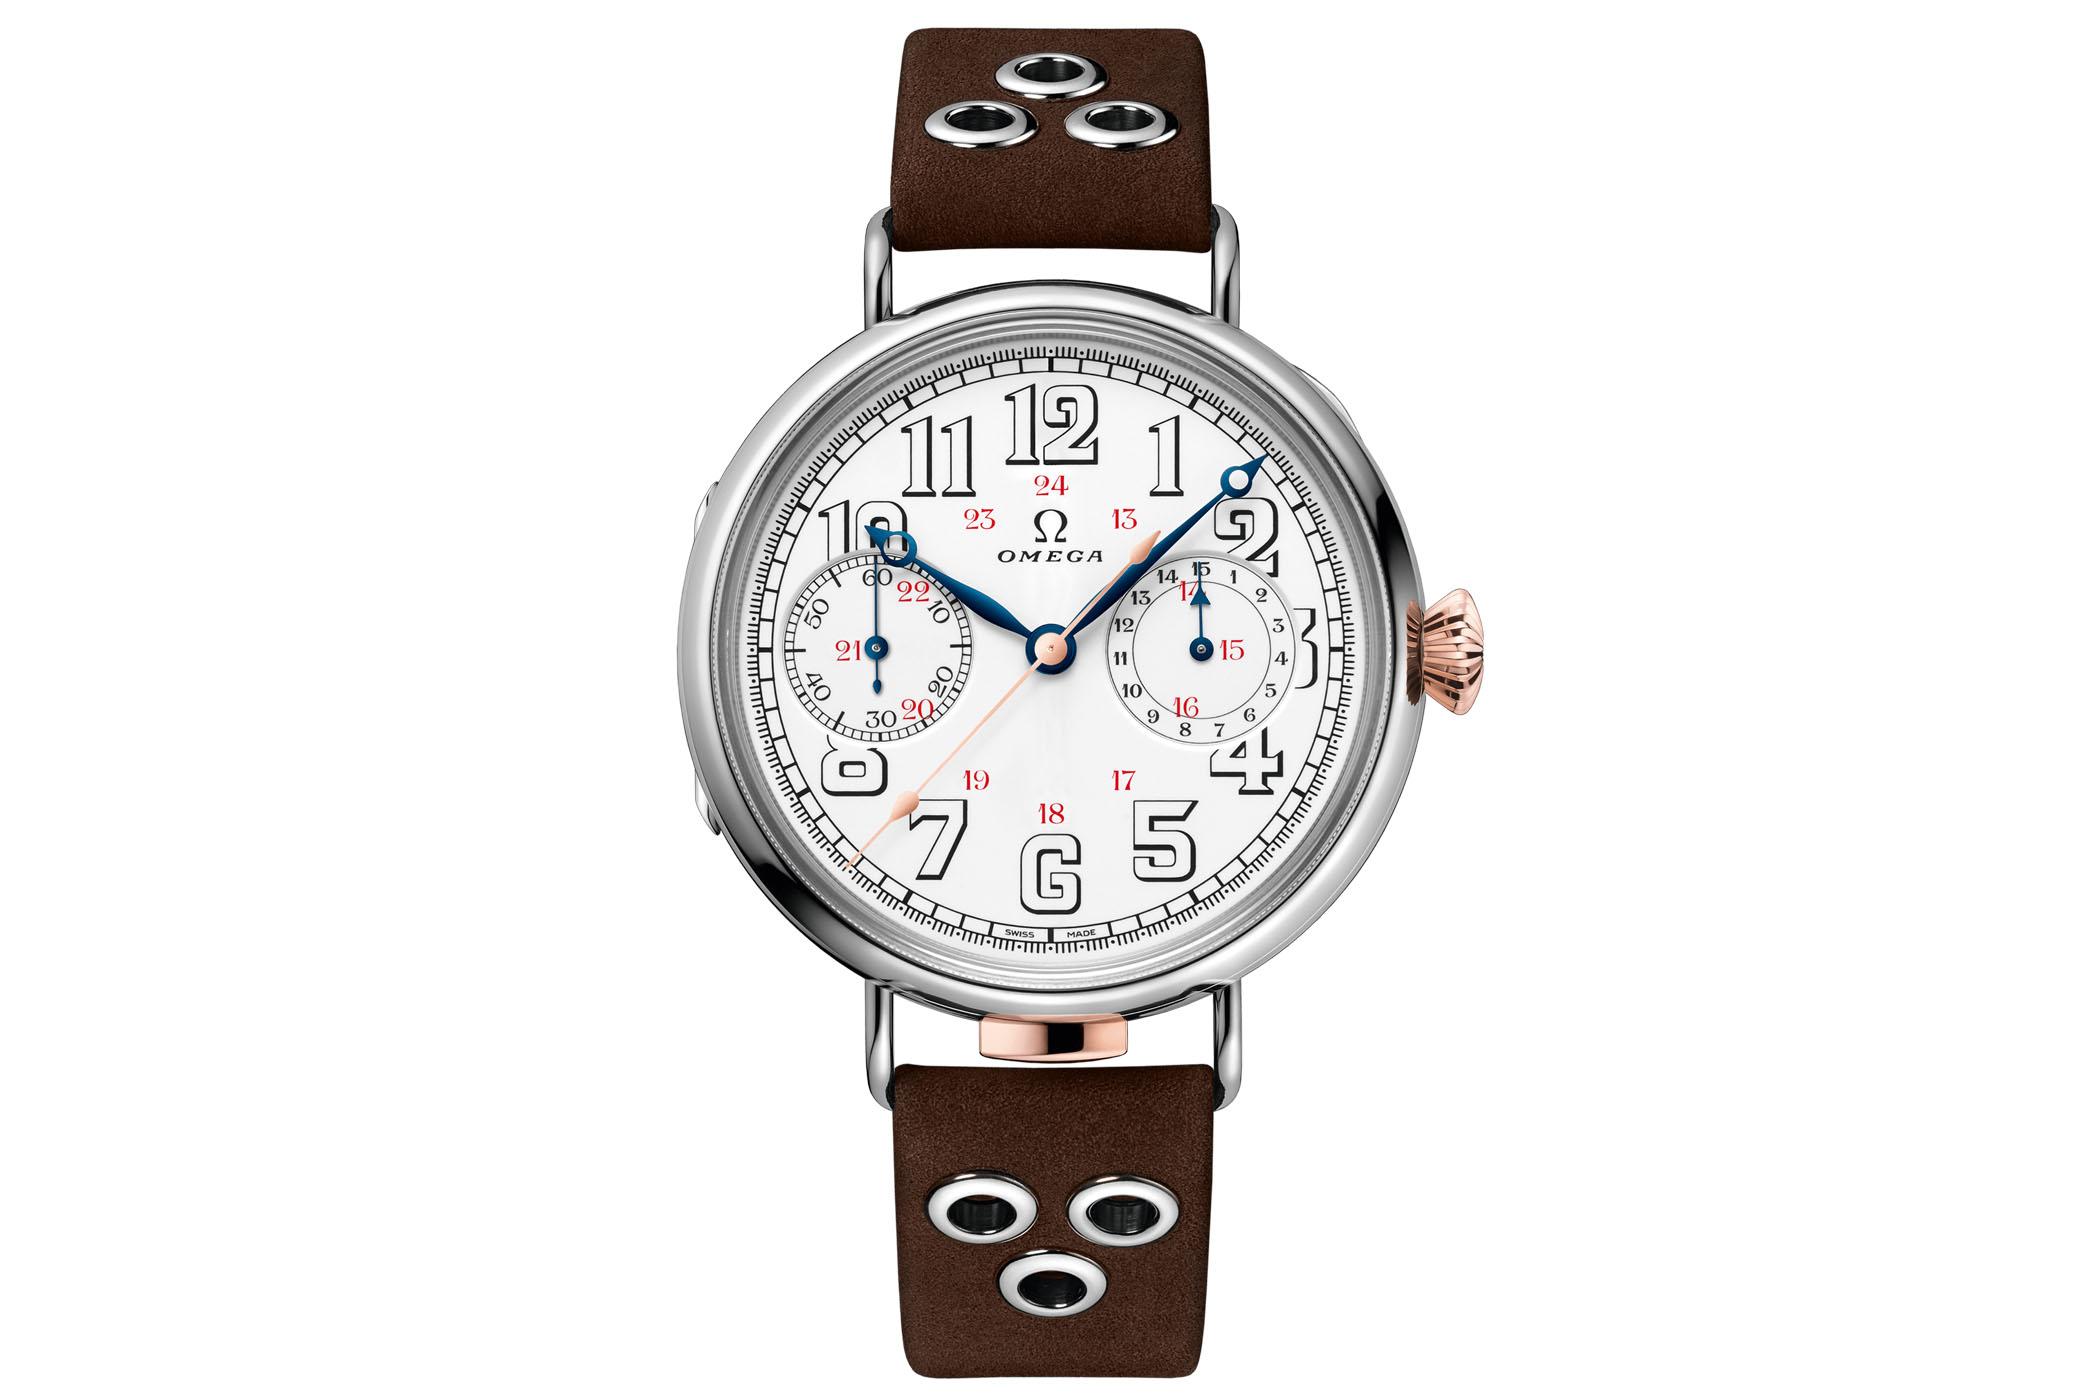 Omega First Wrist Chronograph reissue - 12